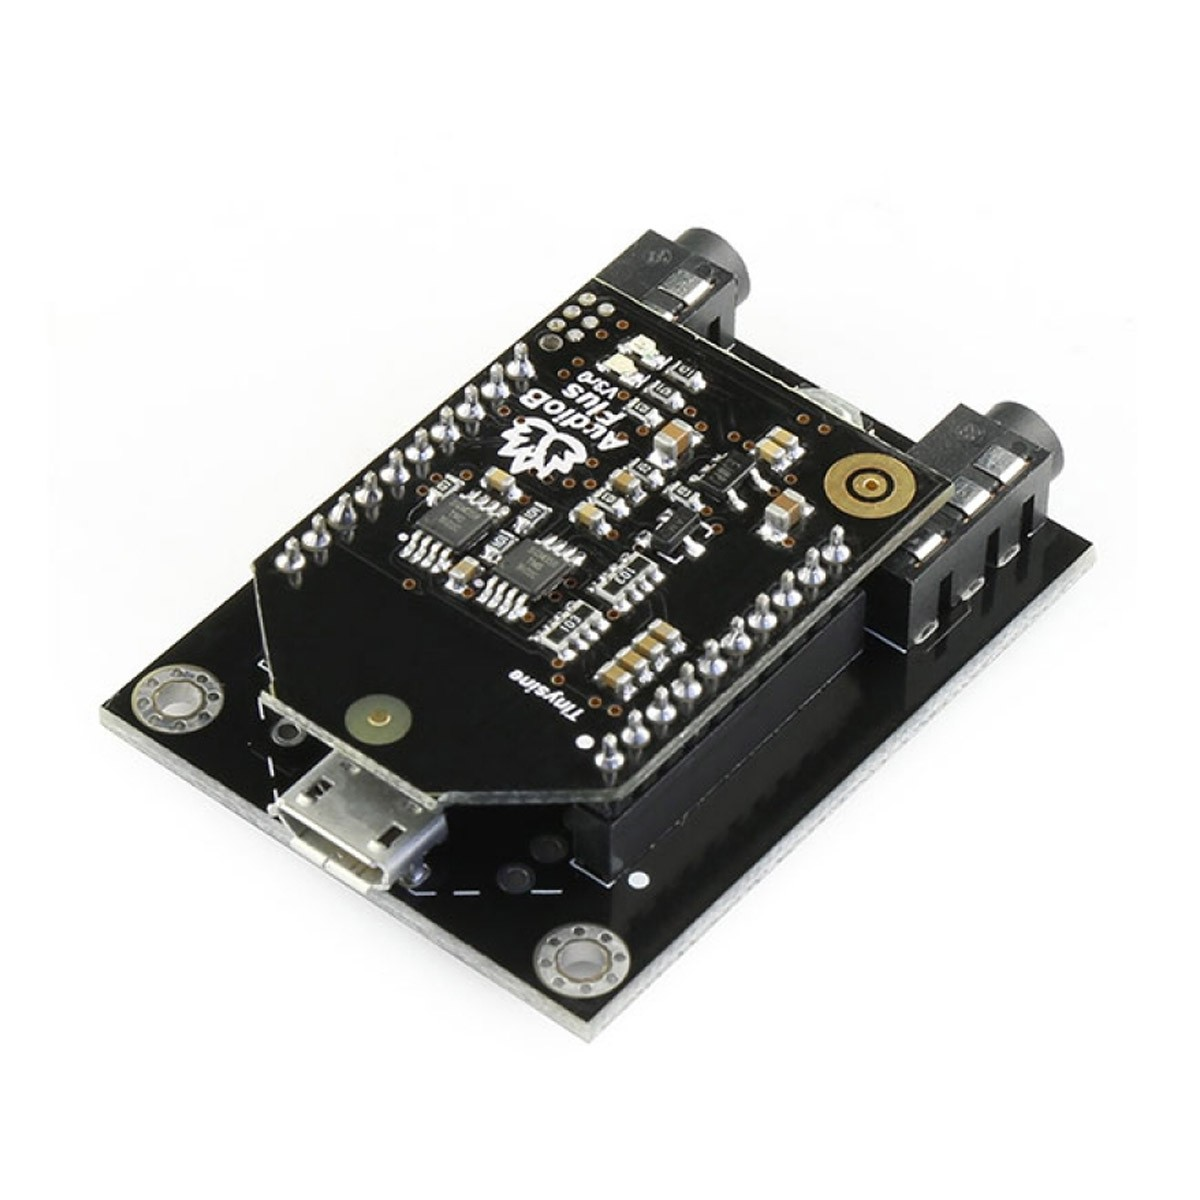 TINYSINE TSA6015 Bluetooth 4.0 Receiver Board CSR8635 wih Microphone Input